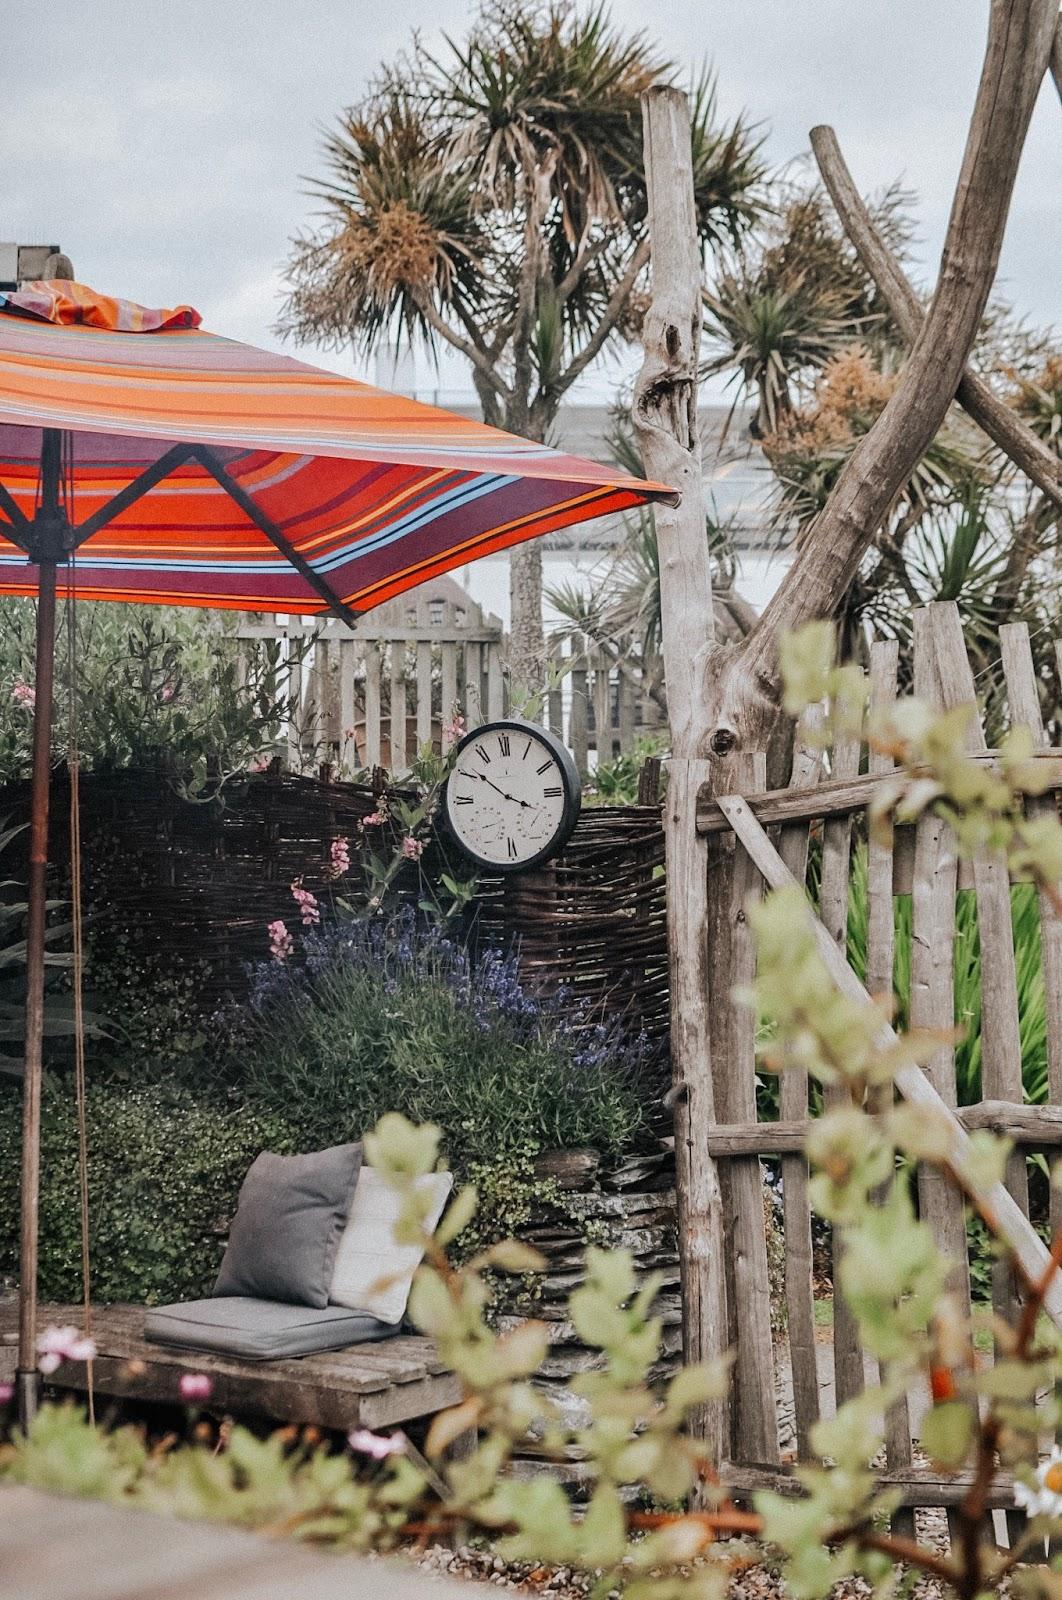 Mawgan Porth Bay, Cornwall Holidays, bedruthan Hotel & Spa, luxury stay cornwall, family holidays cornwall, Sensory Spa Garden